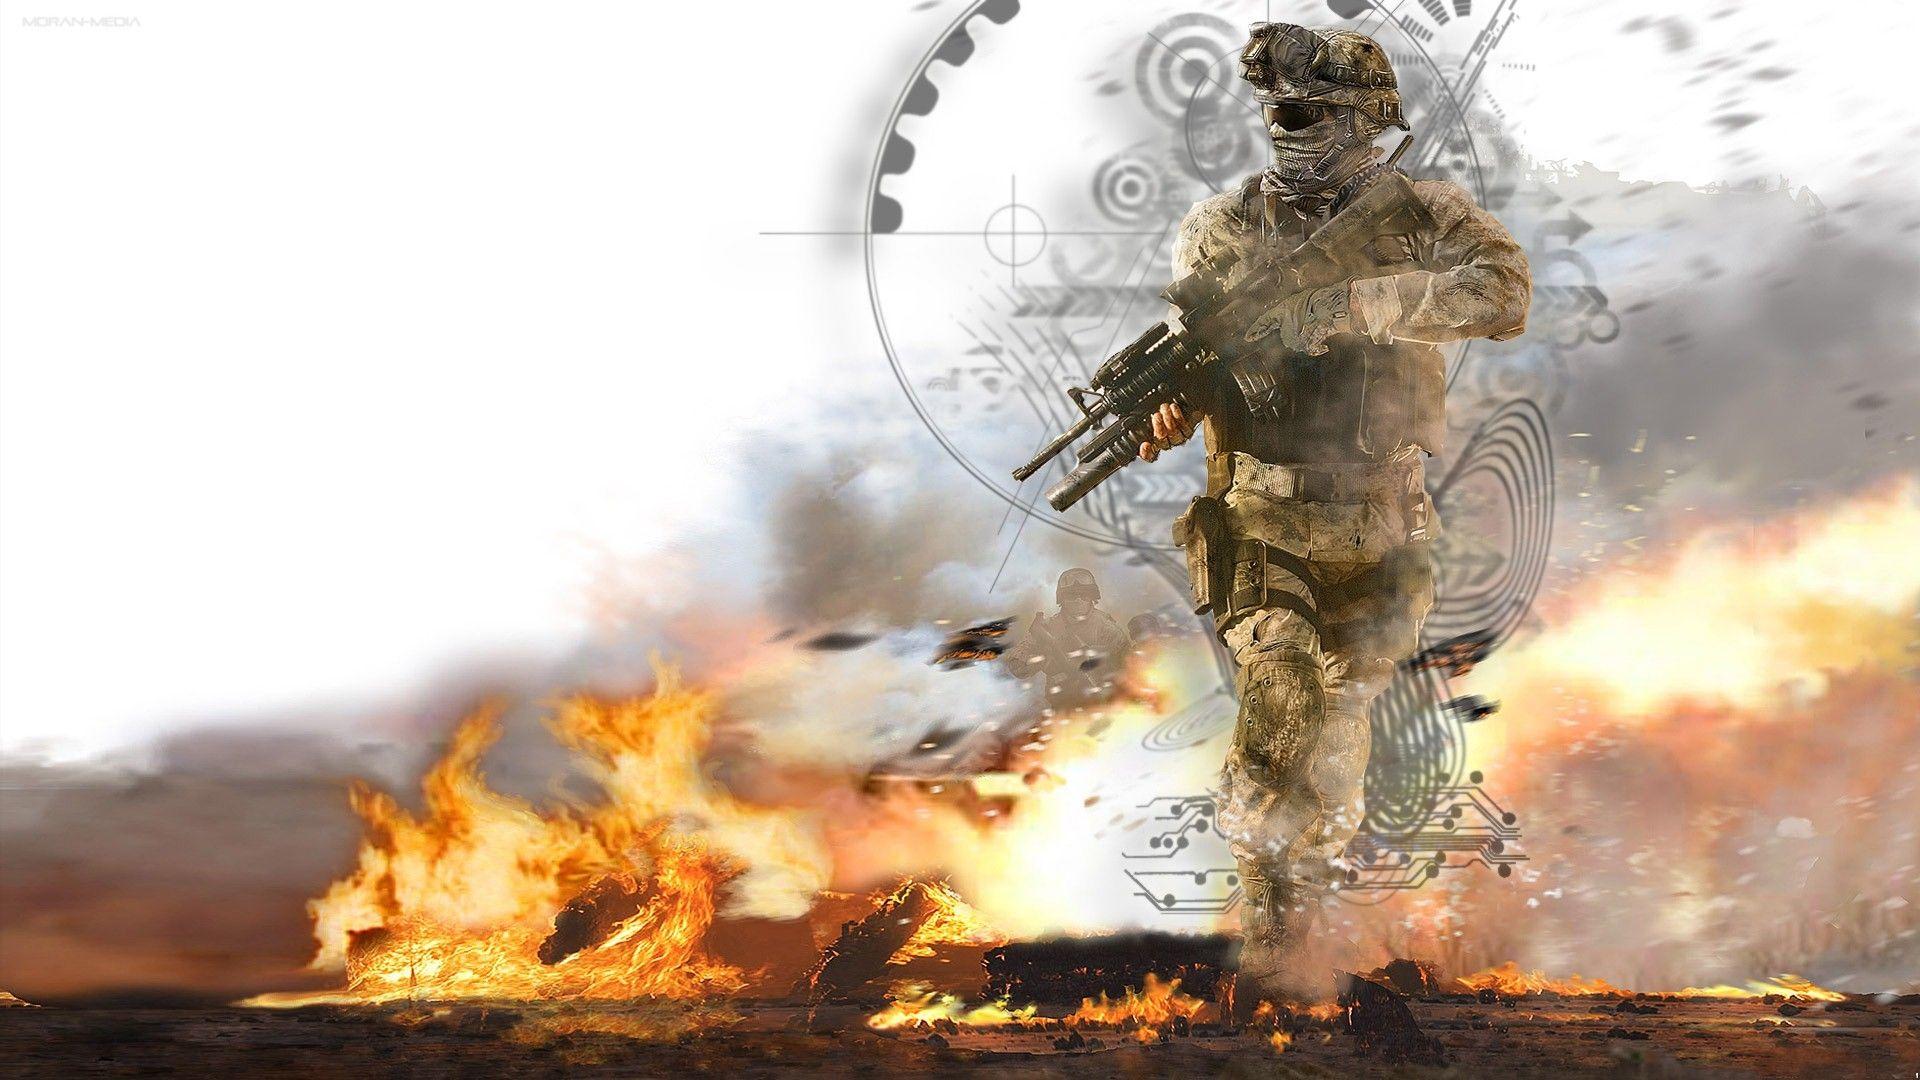 War Army HD Wallpapers, Free Wallpaper Downloads, War Army ...